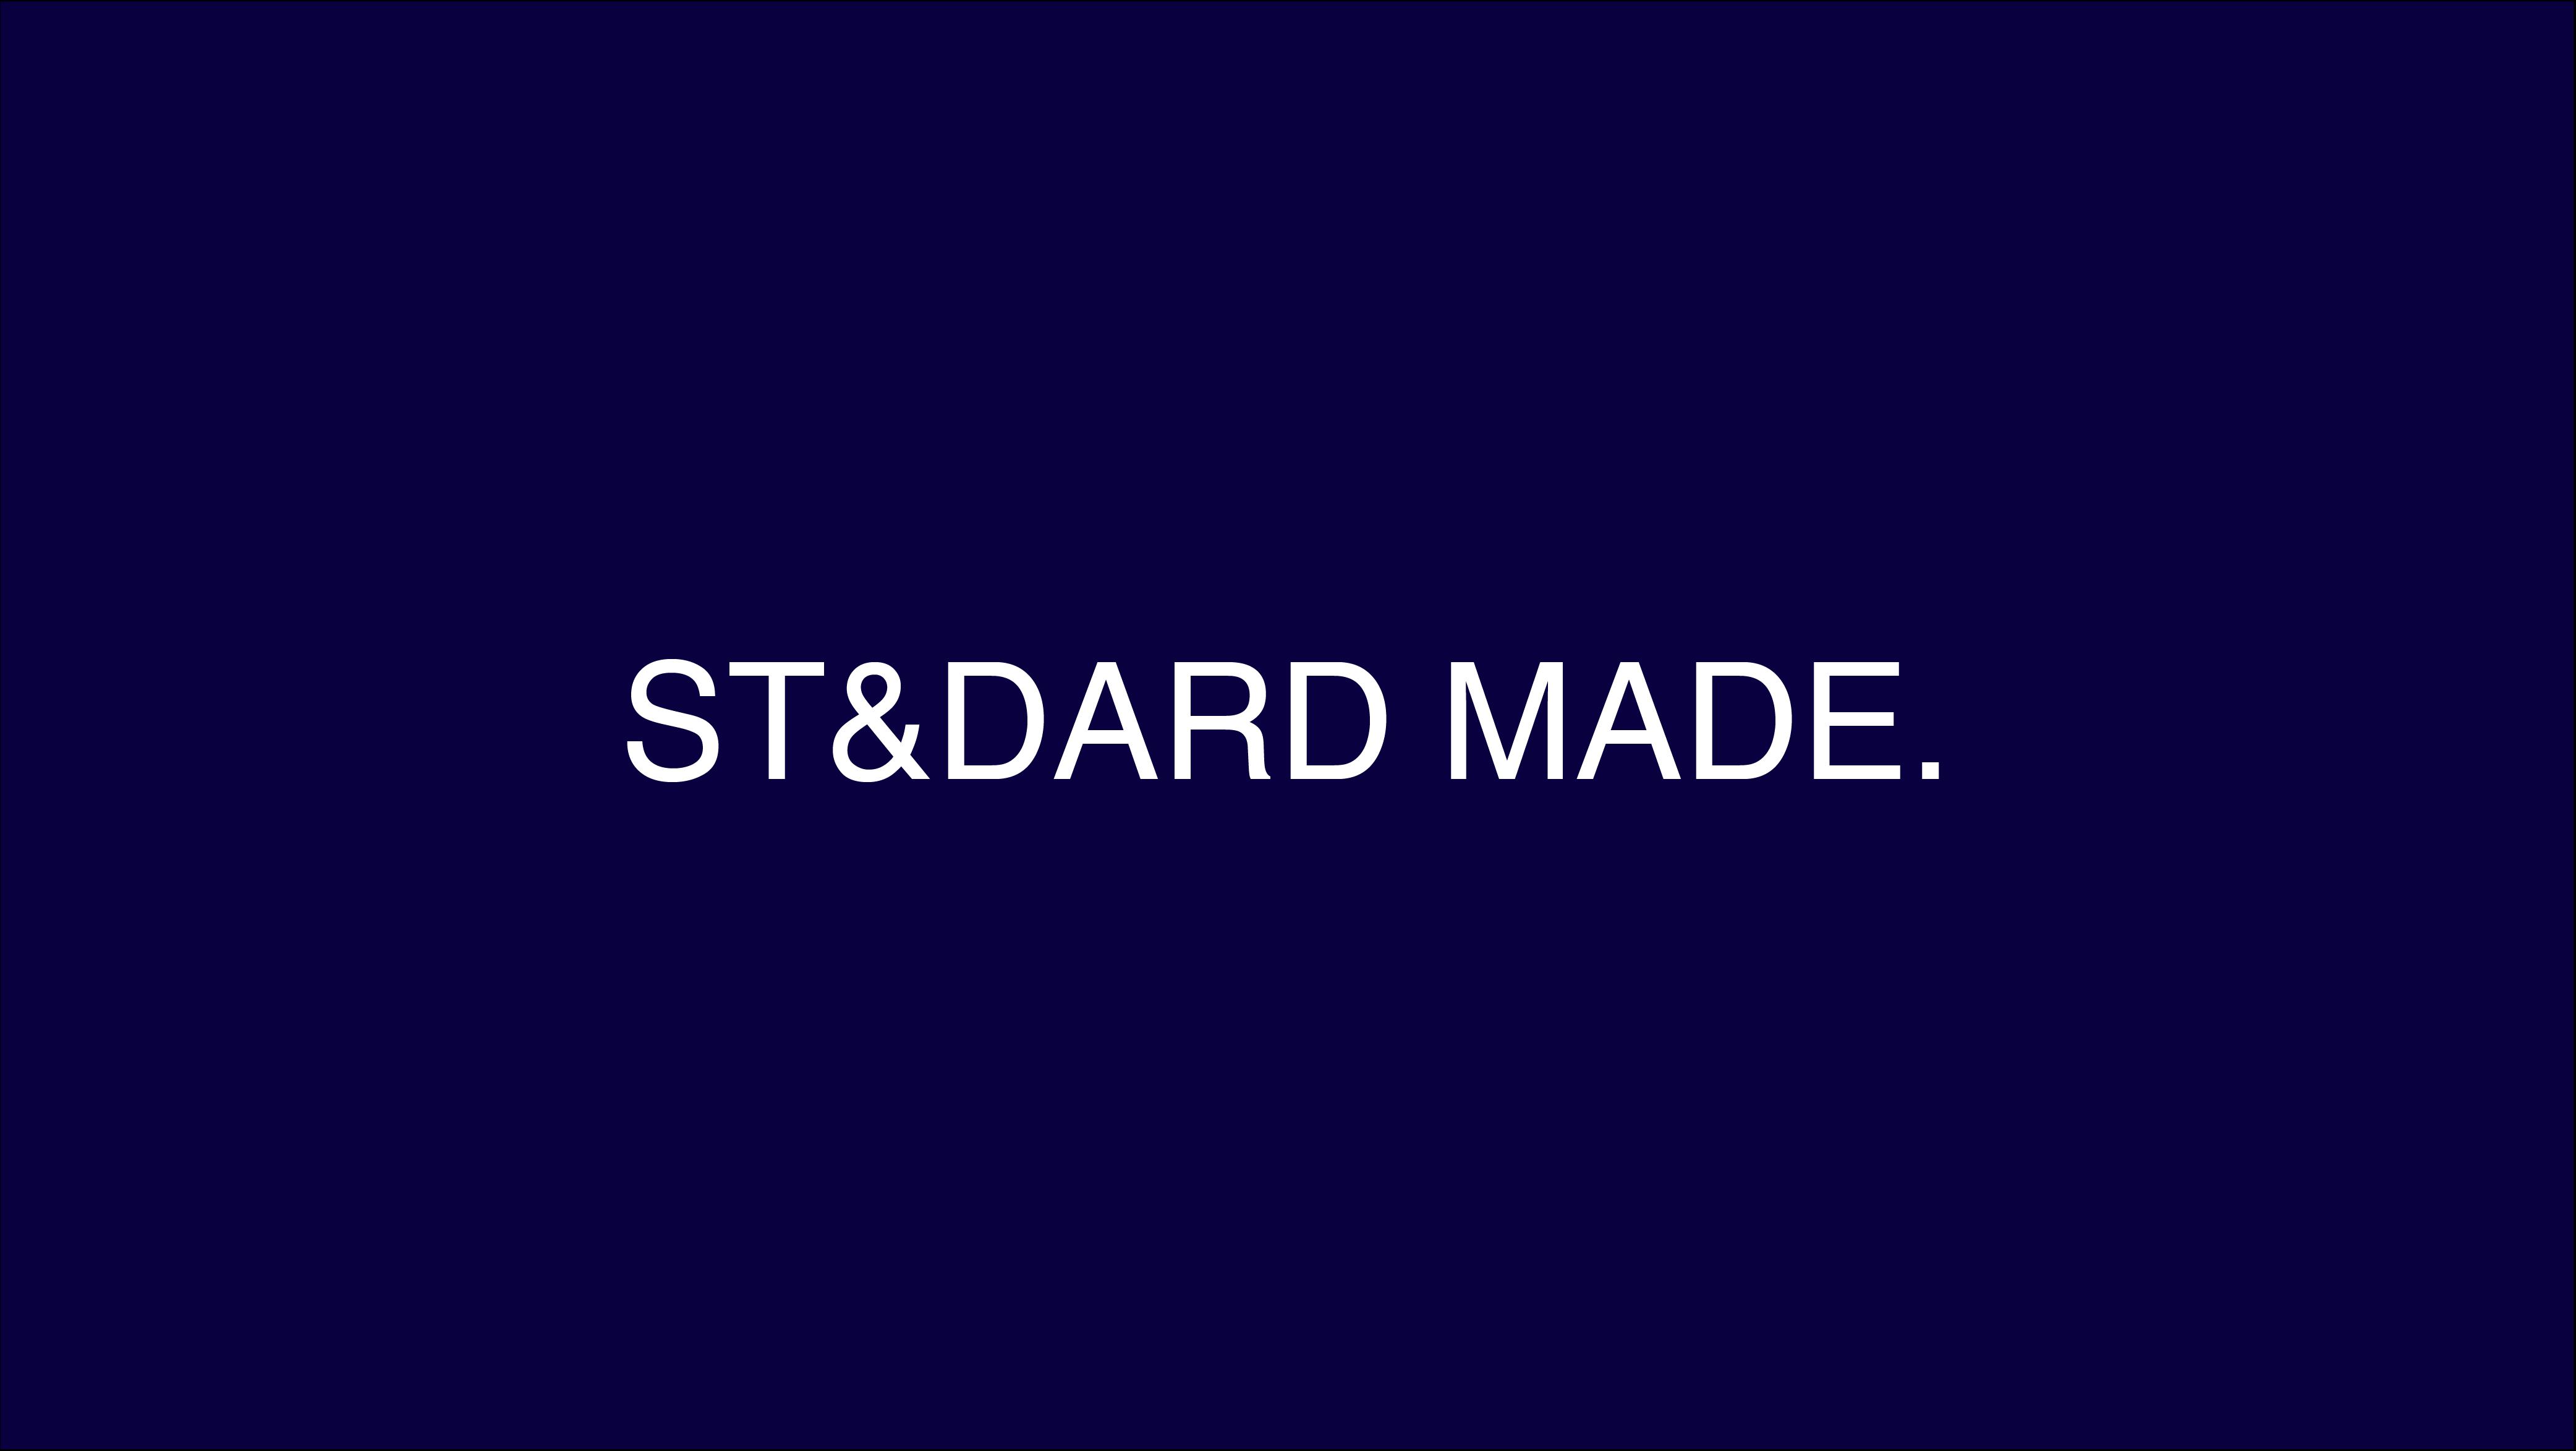 ST&DARD MADE. Online Store